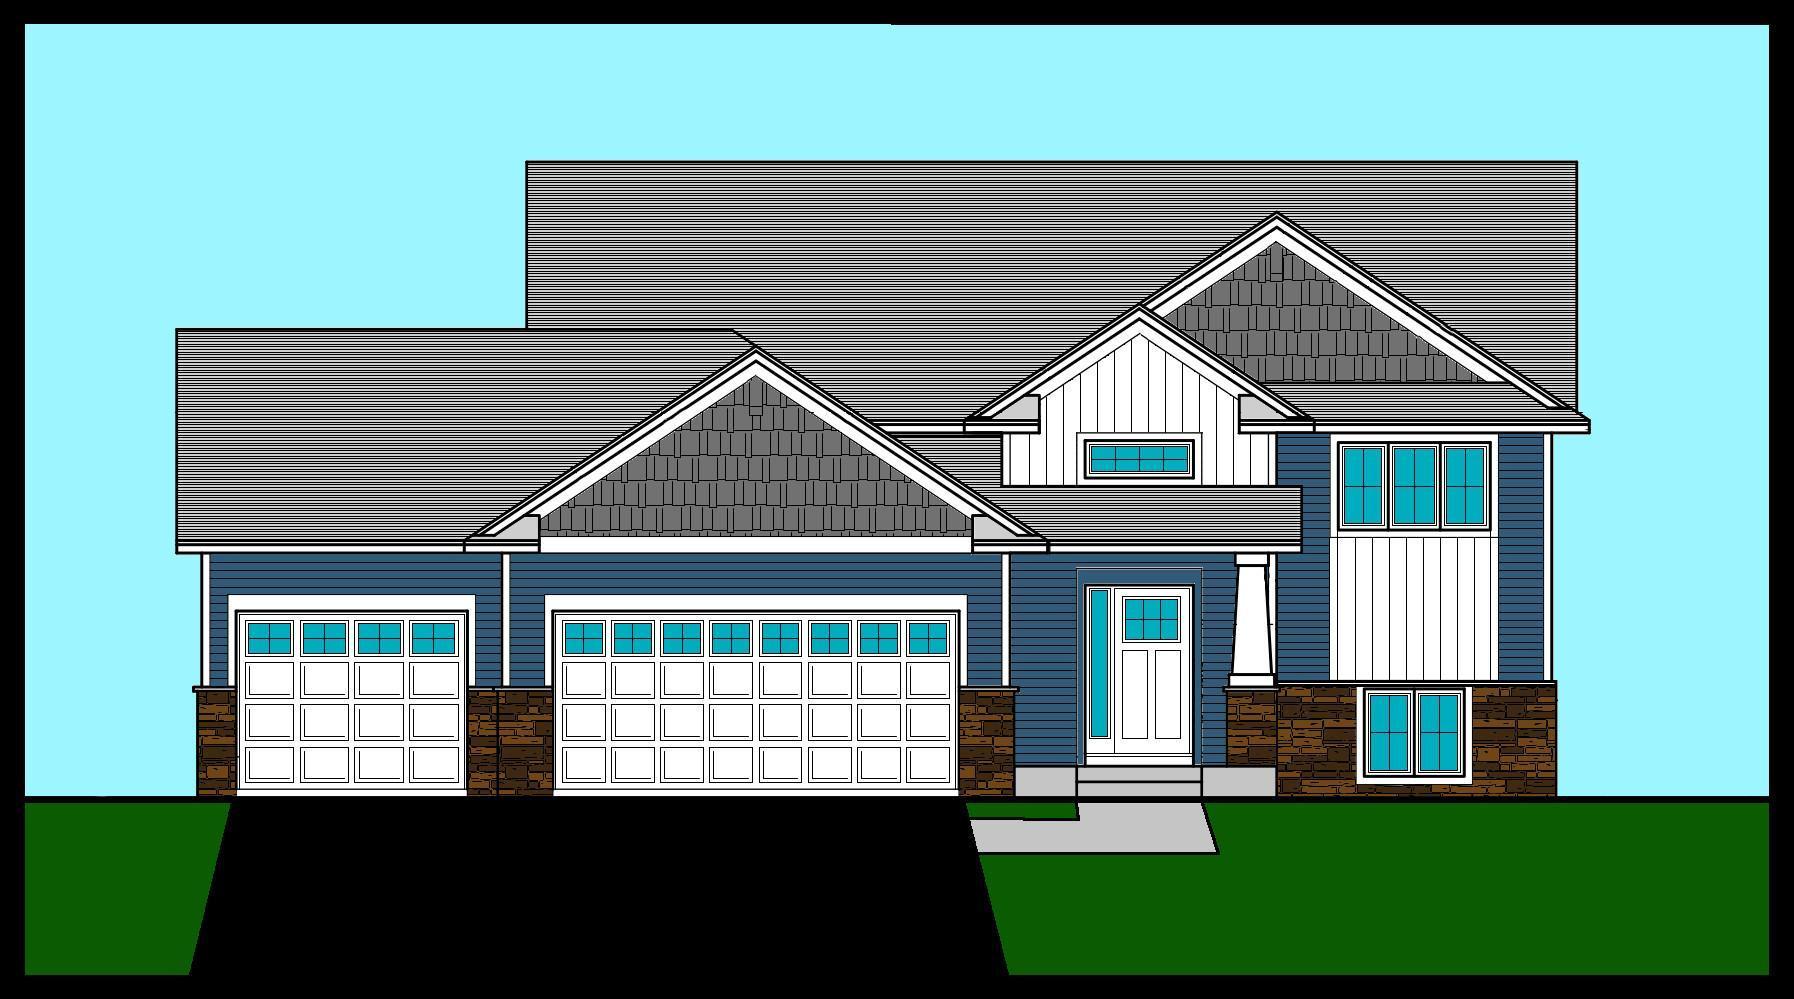 1176 242nd Way NE Property Photo - East Bethel, MN real estate listing